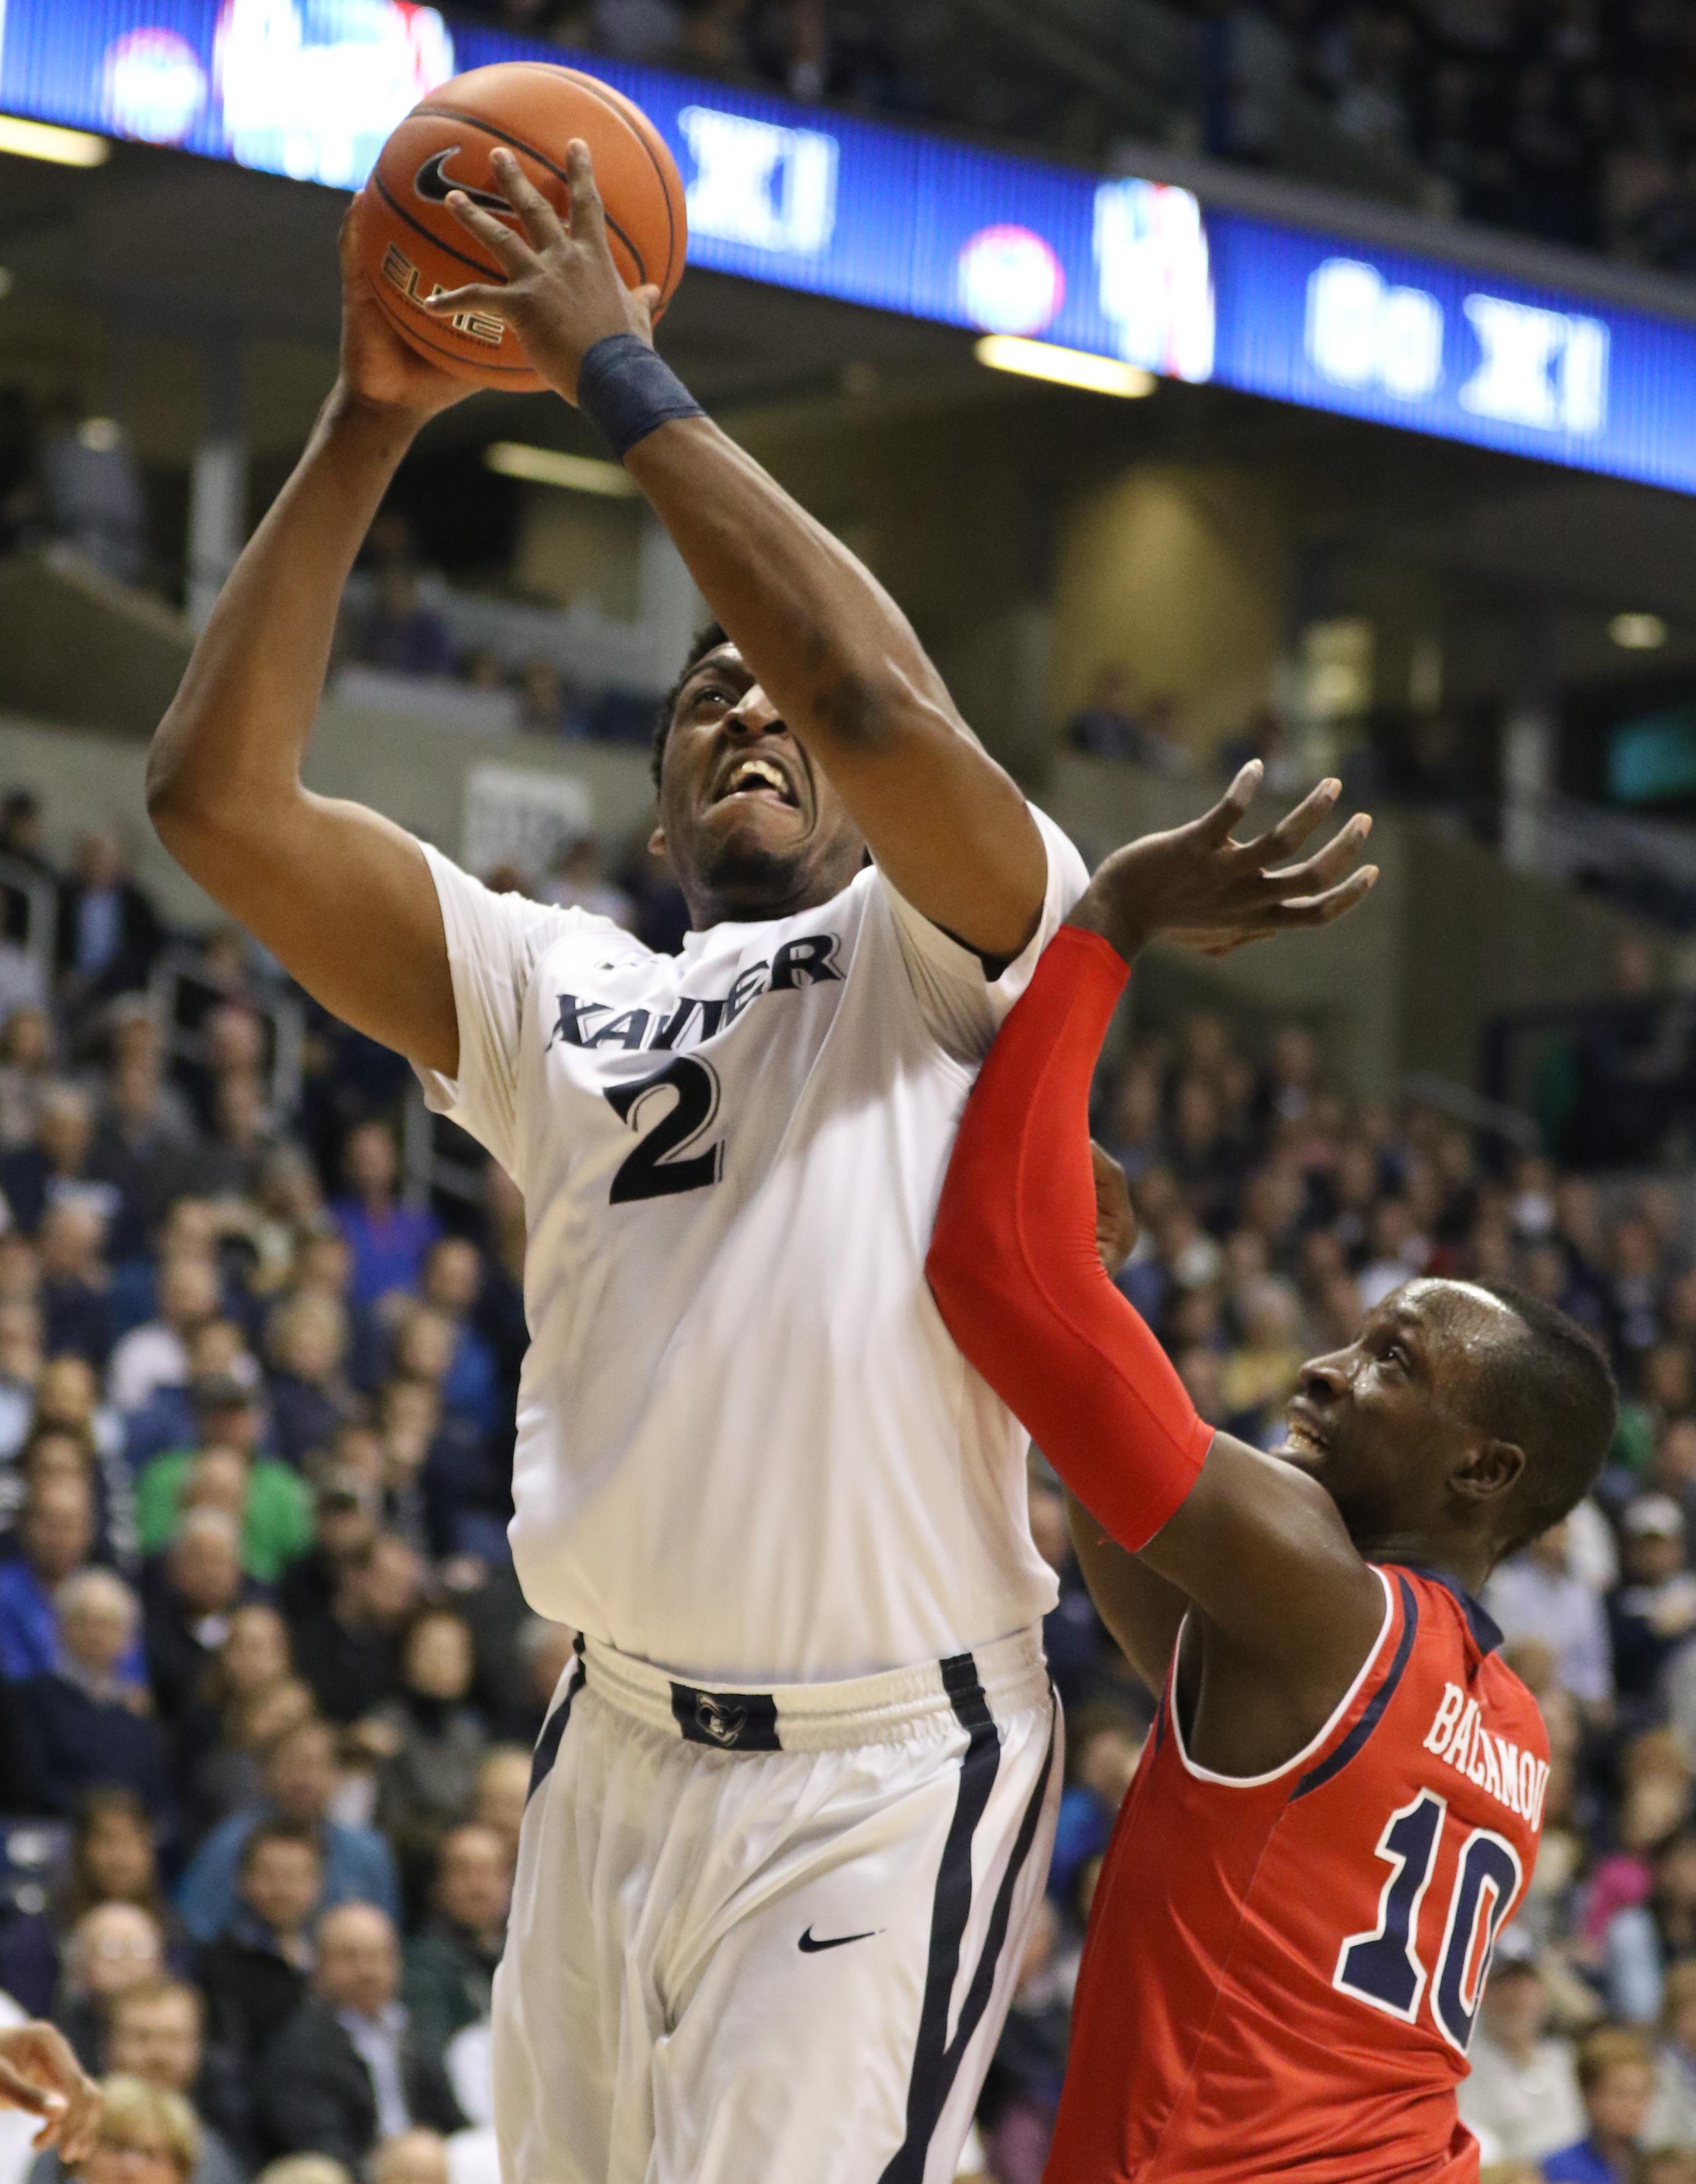 Xavier forward James Farr (2) puts up a shot against St. John's guard Felix Balamou (10) during the first half of an NCAA college basketball game Wednesday, Feb. 3, 2016, in Cincinnati. (AP Photo/Gary Landers)